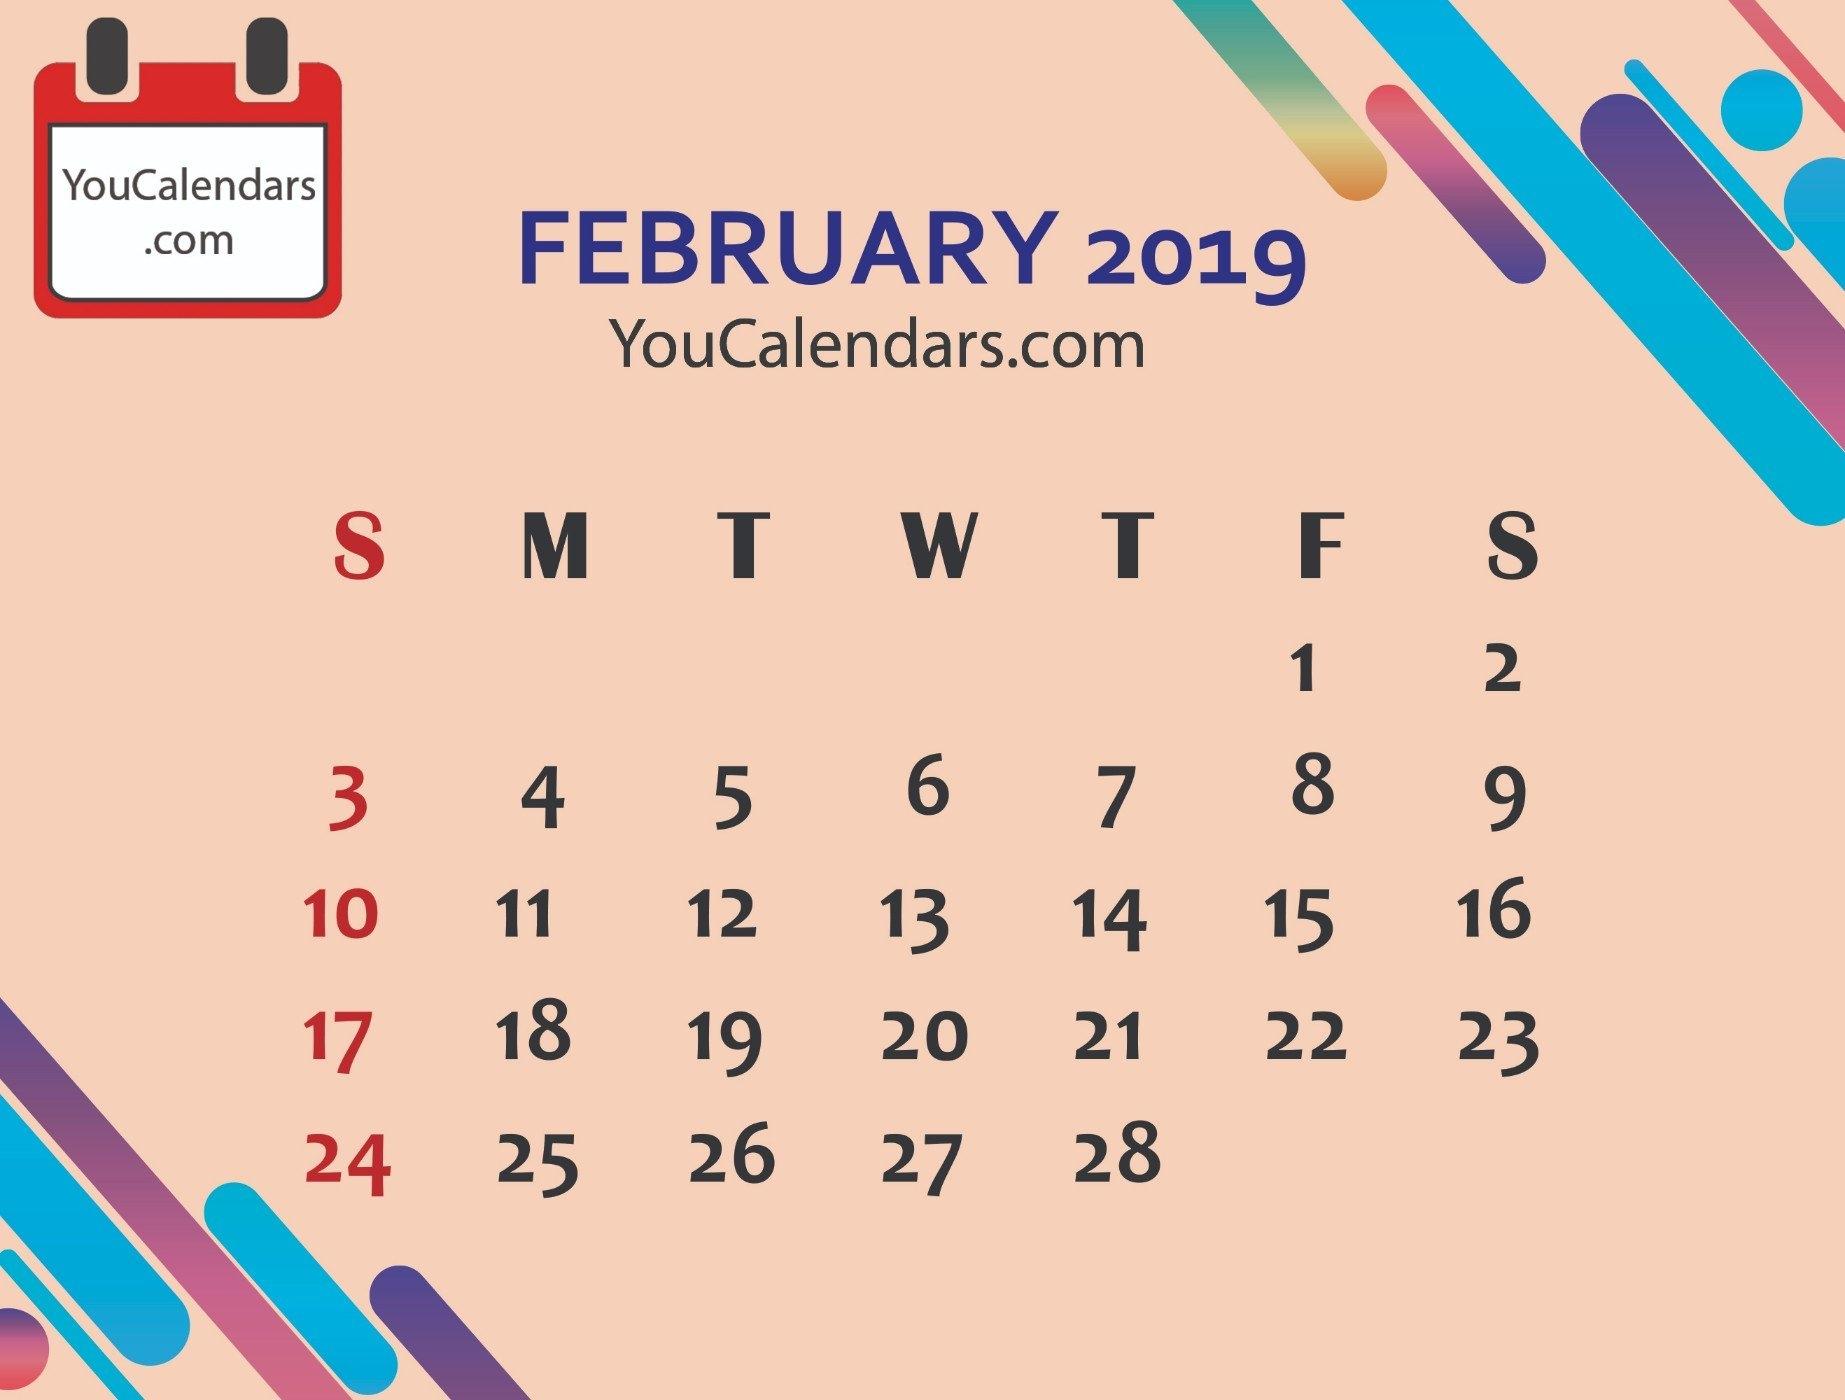 2019 Calendar Archives - You Calendars Feb 9 2019 Calendar